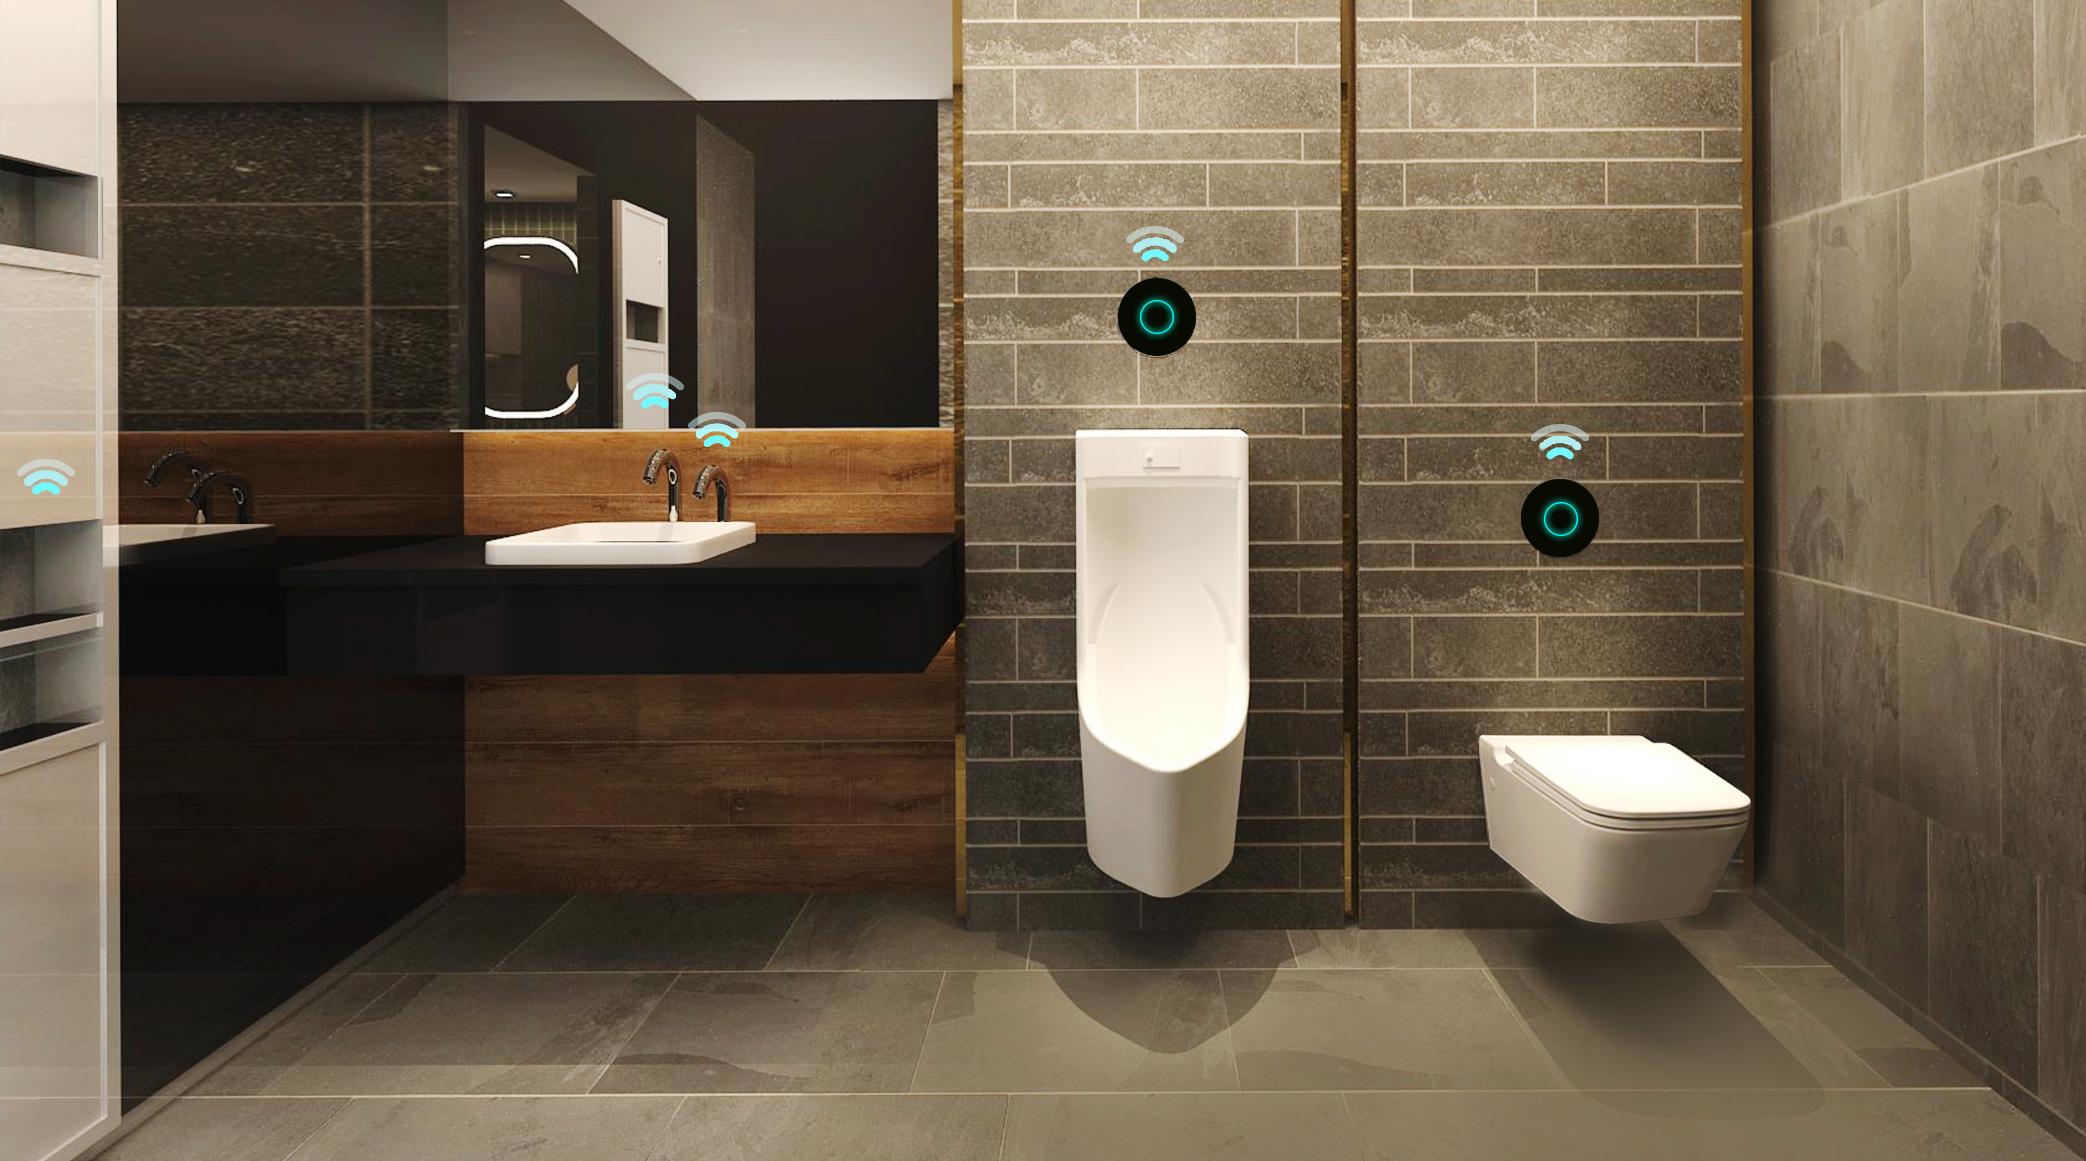 iRigel – Internet-of-Toilet Management System